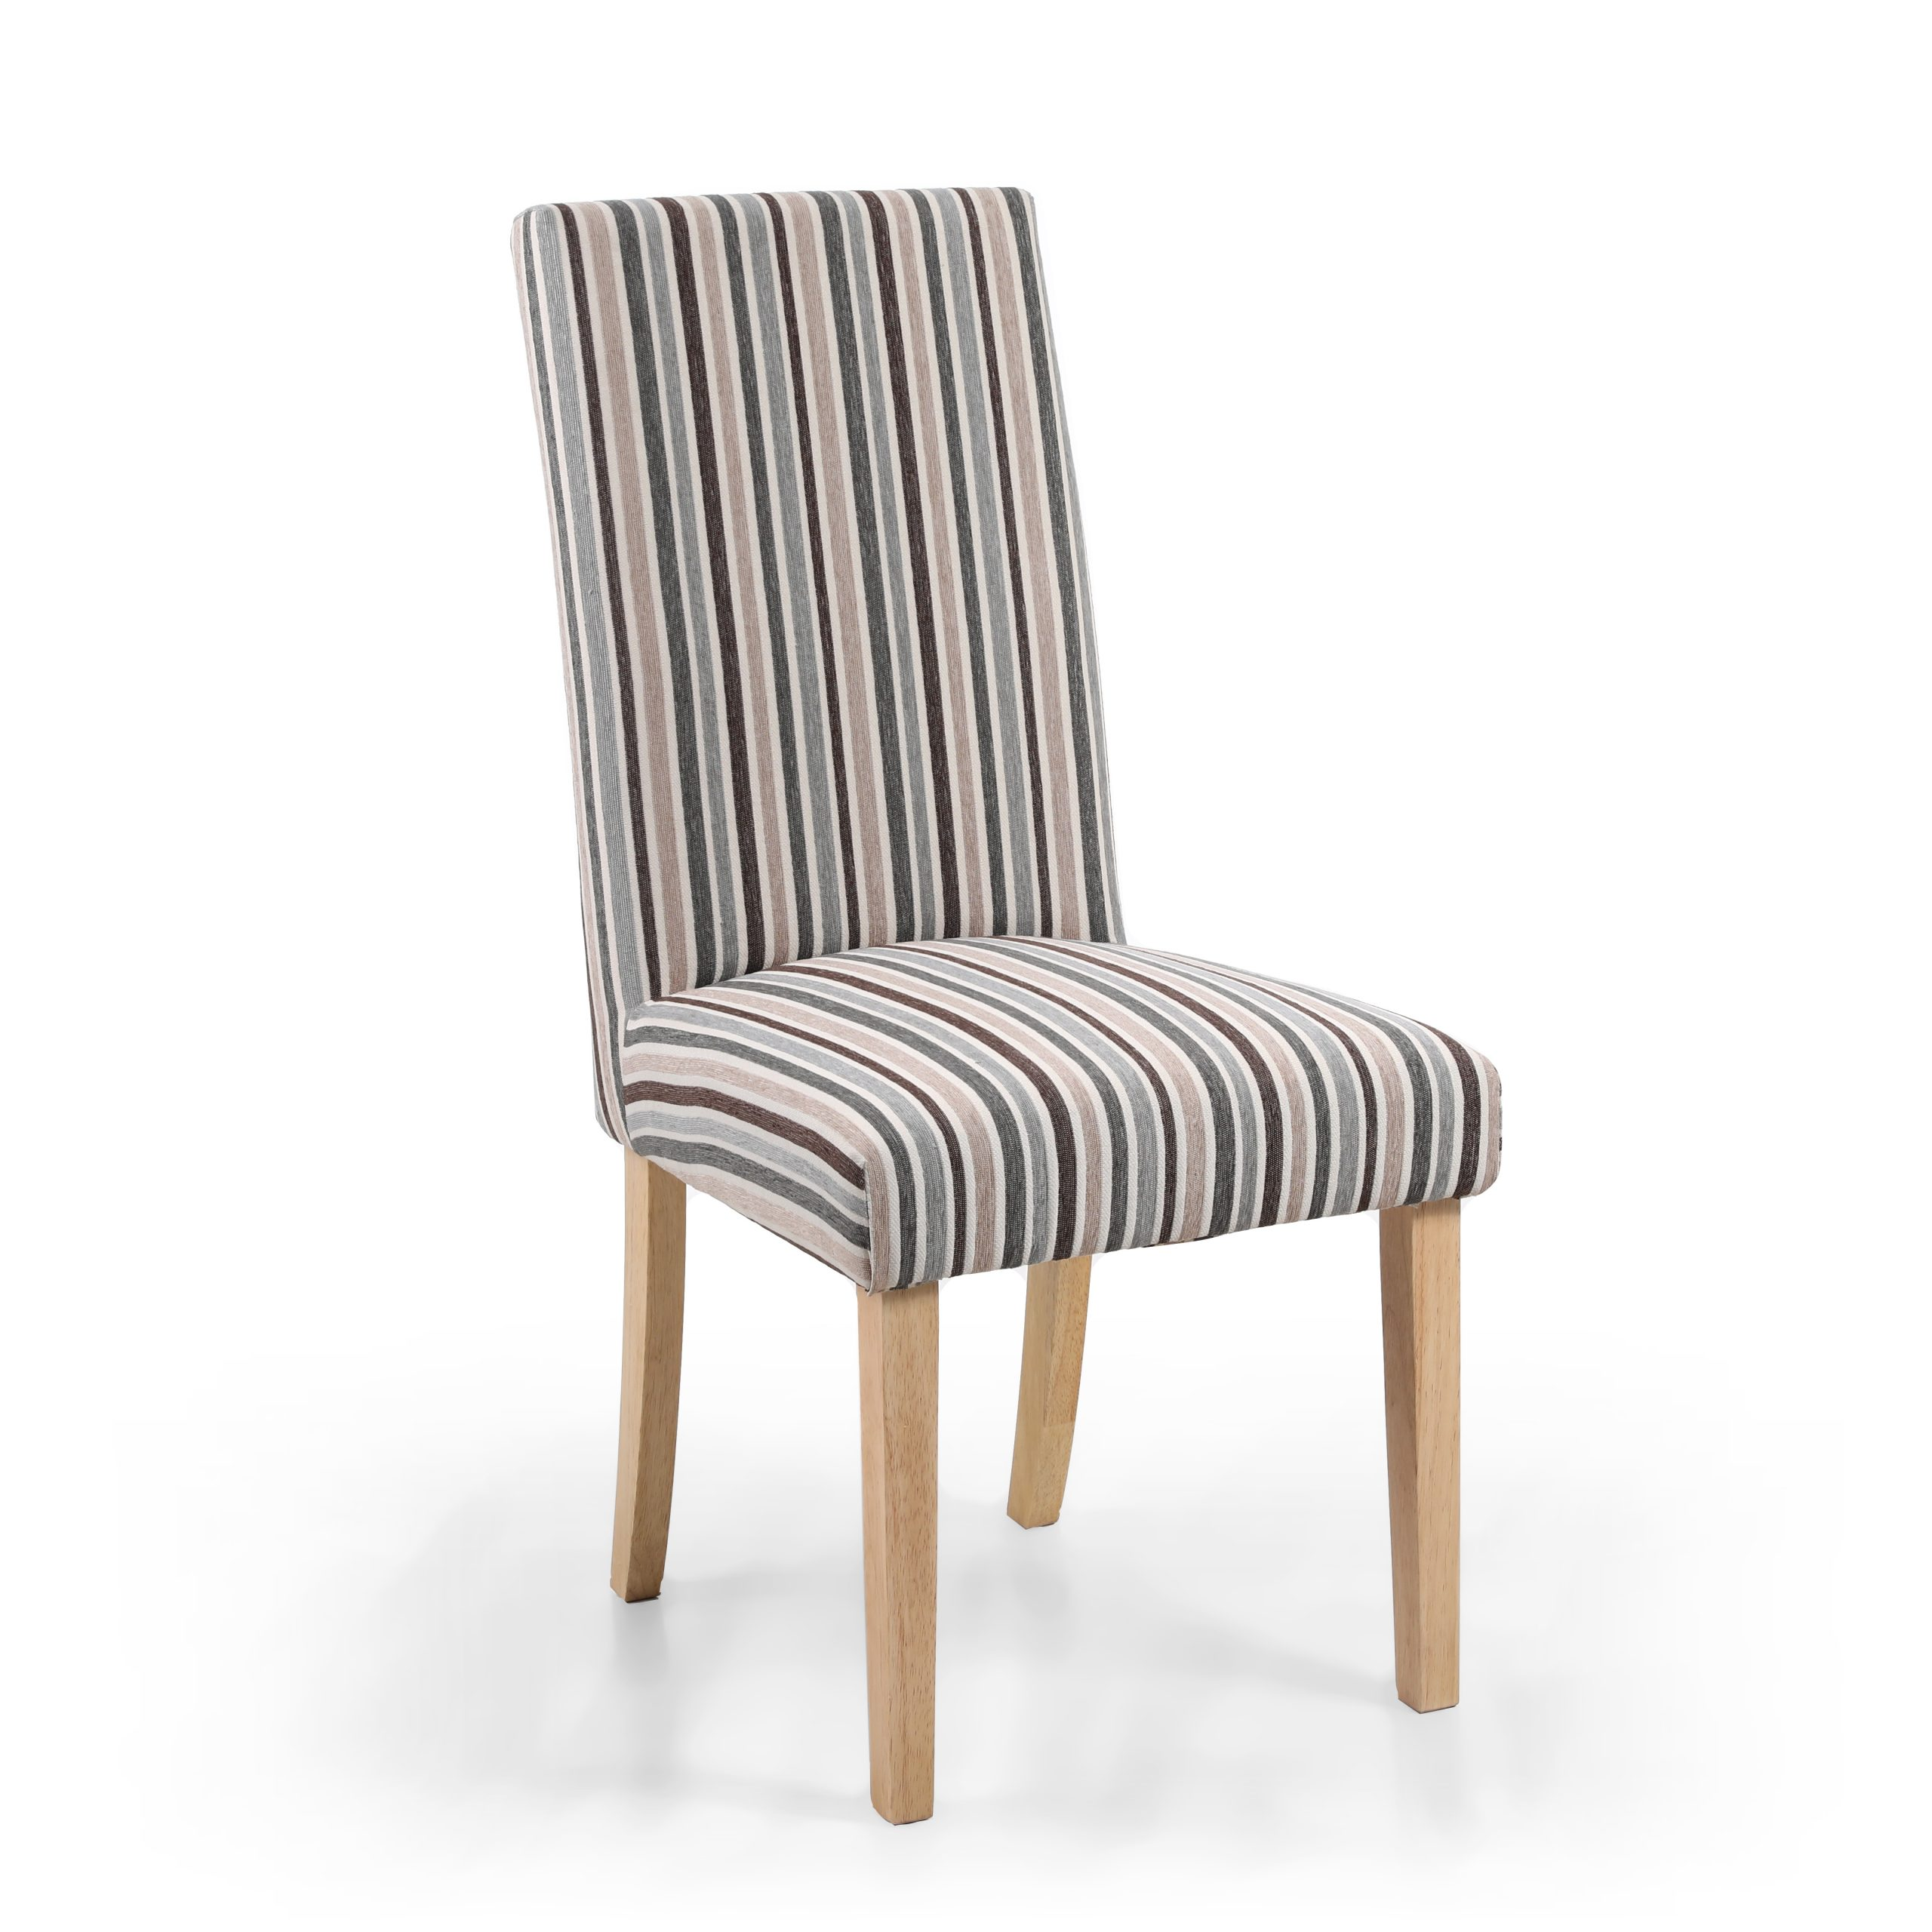 Ripley Stripe High Back dining chair